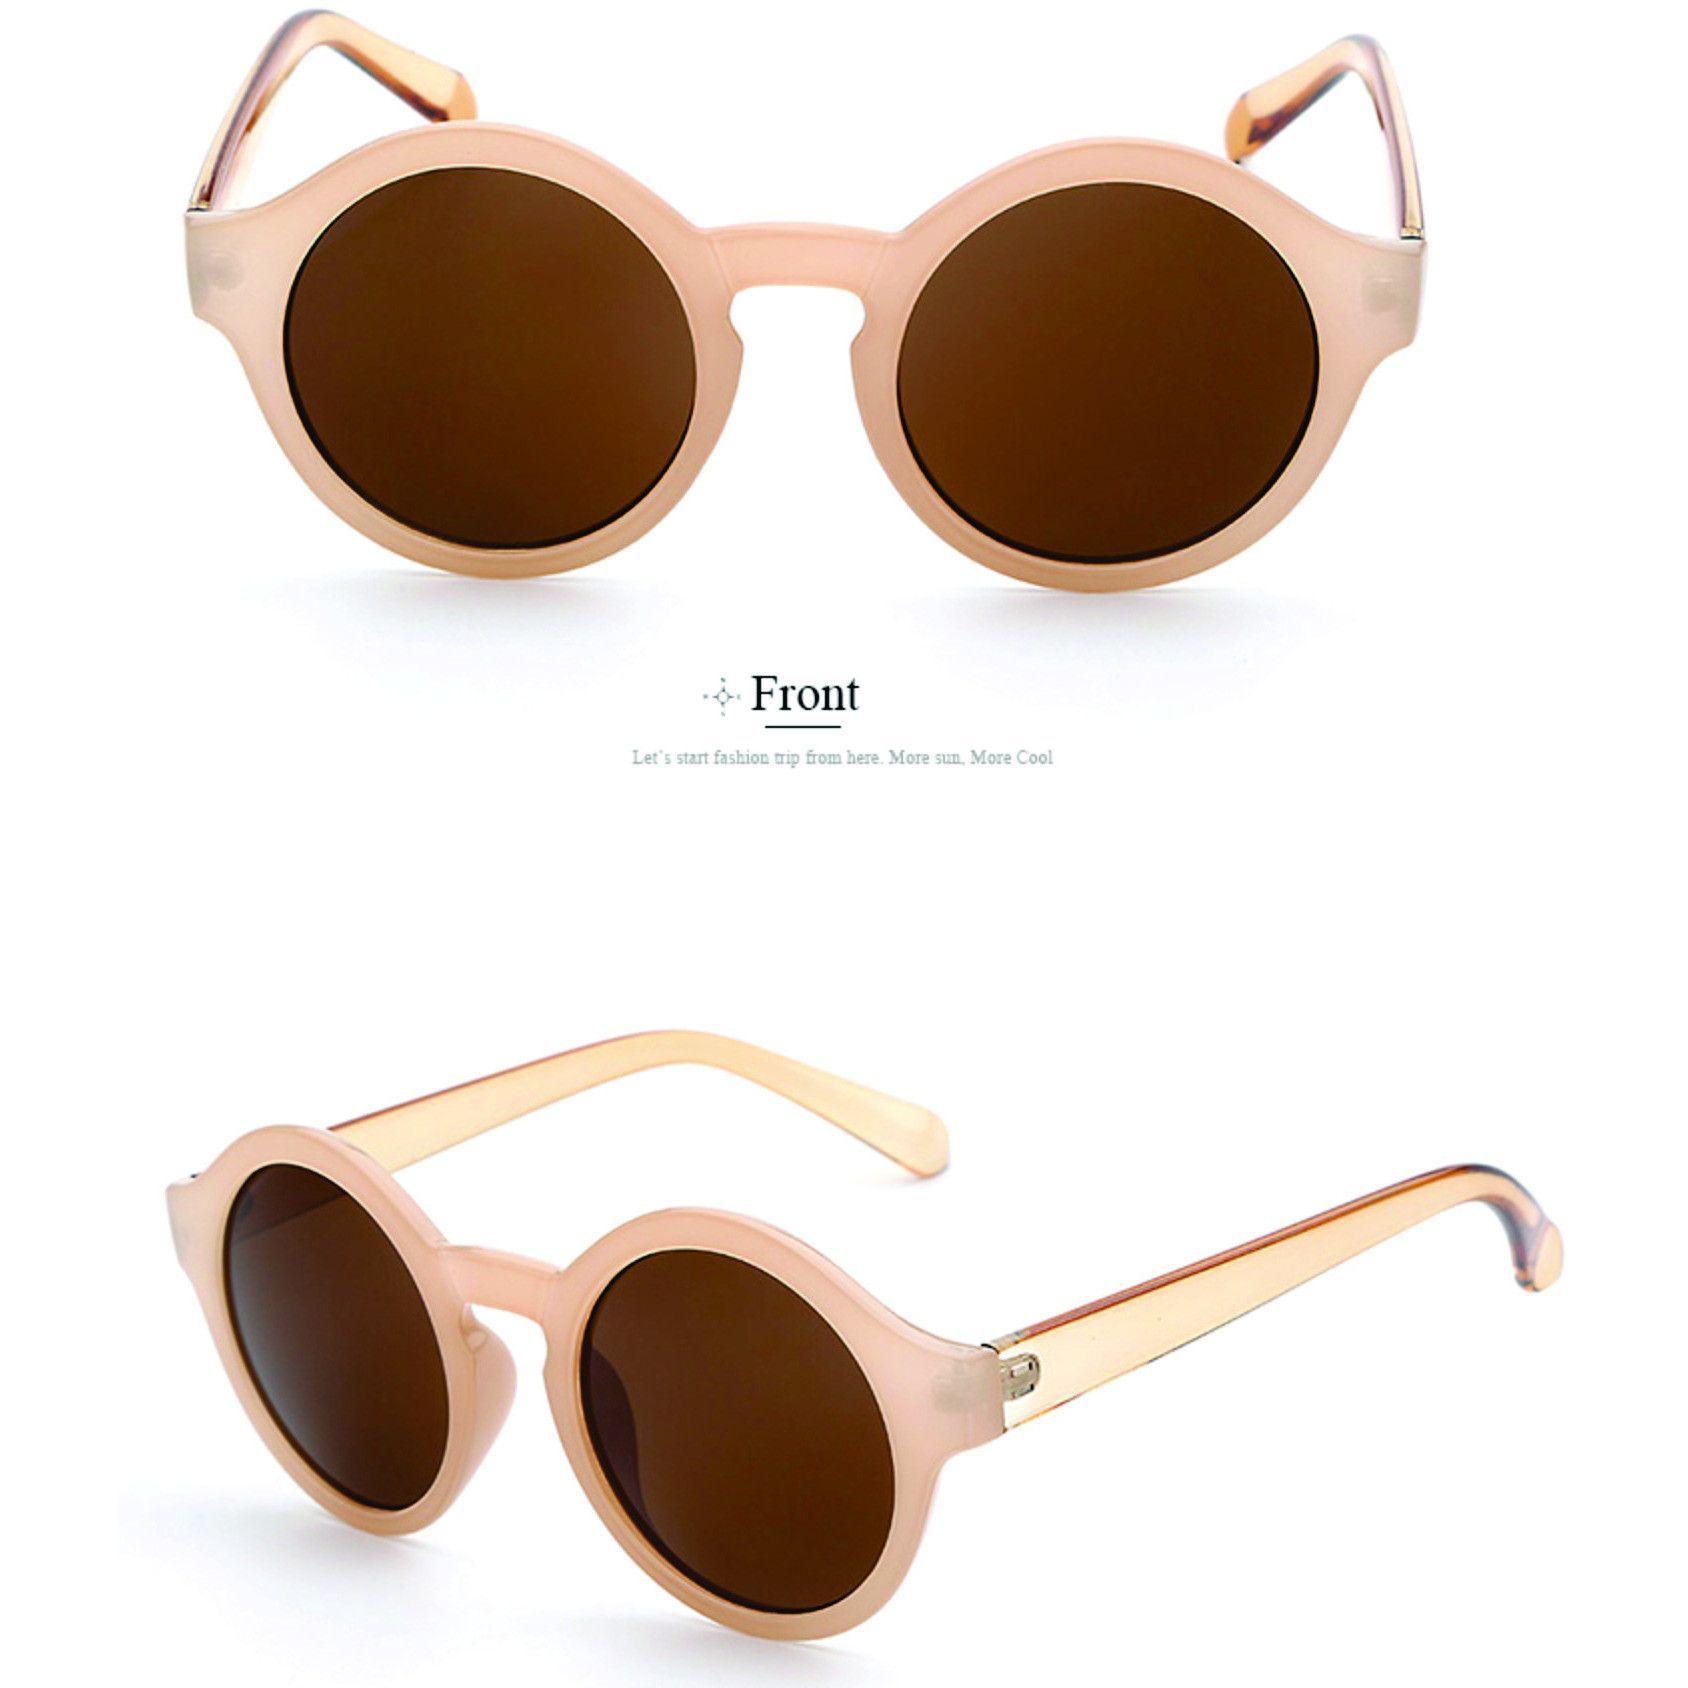 c922b09948 Women Fashion Accessories Sunglasses Round Circle Sunglasses Women Retro  Vintage Sunglasses for Women Brand Designer Sunglasses Accessories